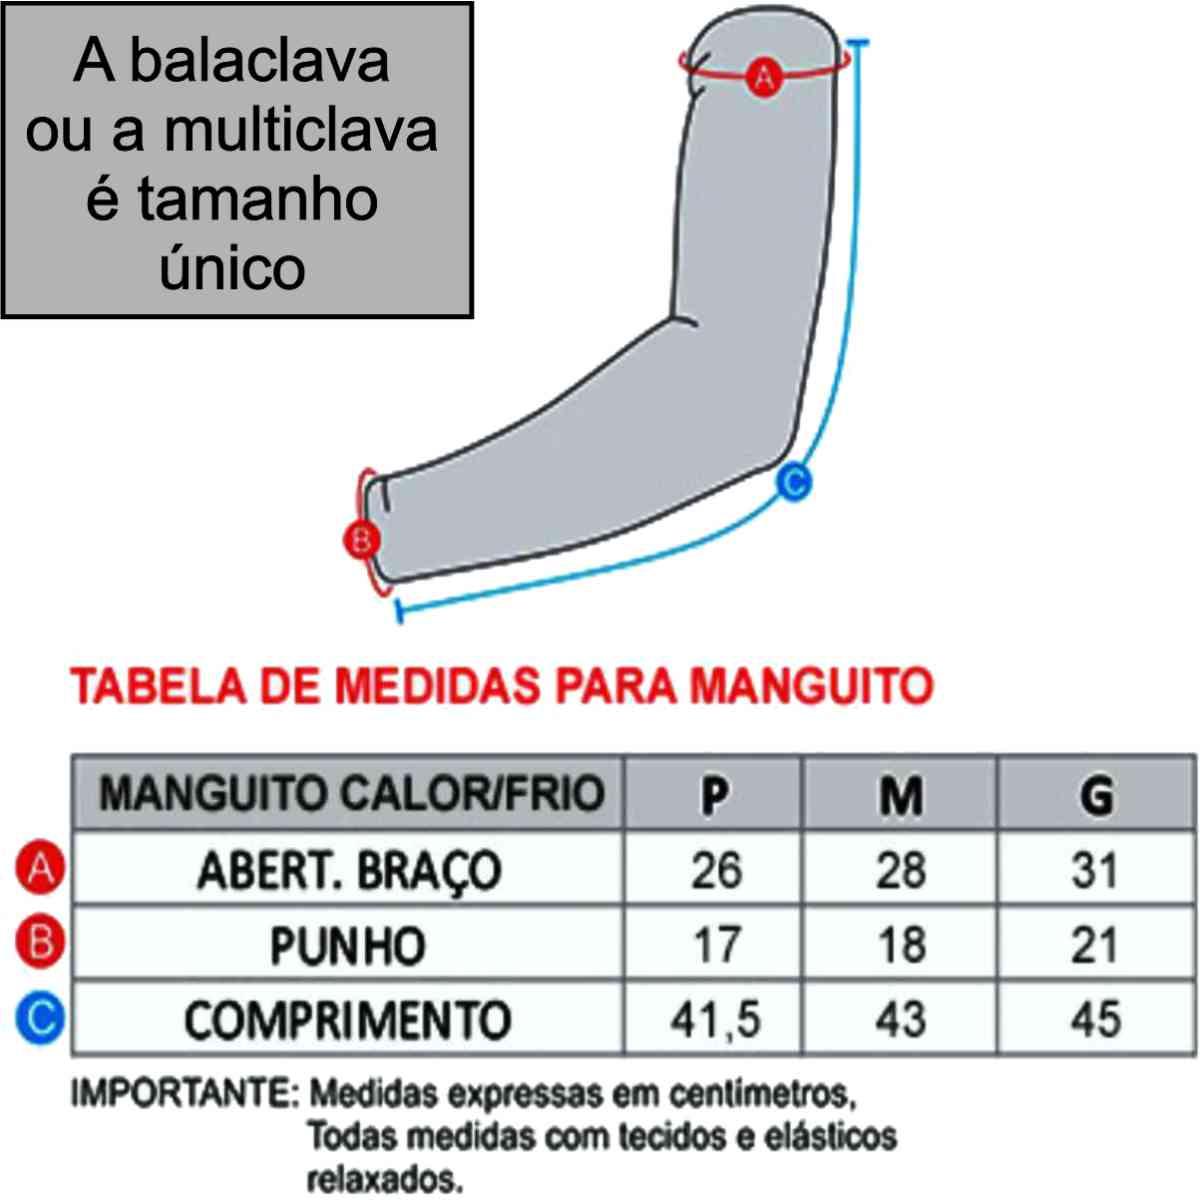 BALACLAVA GO AHEAD SEGUNDA PELE ULTRA + MANGUITO ULTRA FRIO INVERNO